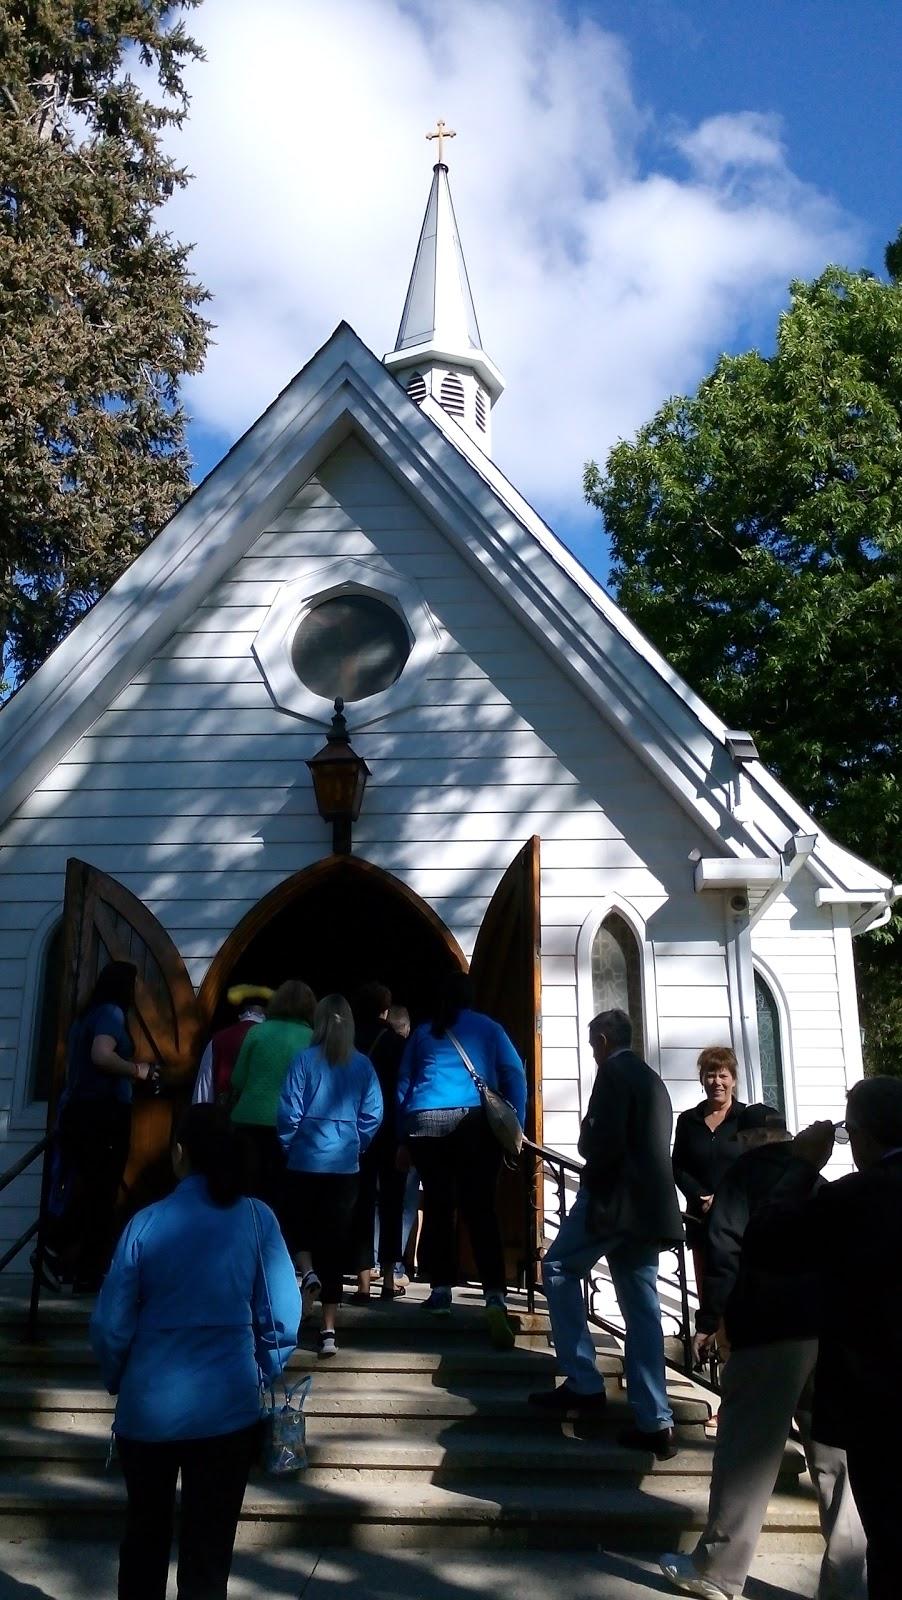 St. Lukes Anglican Church   church   1382 Ontario St, Burlington, ON L7S 1G1, Canada   9056341826 OR +1 905-634-1826